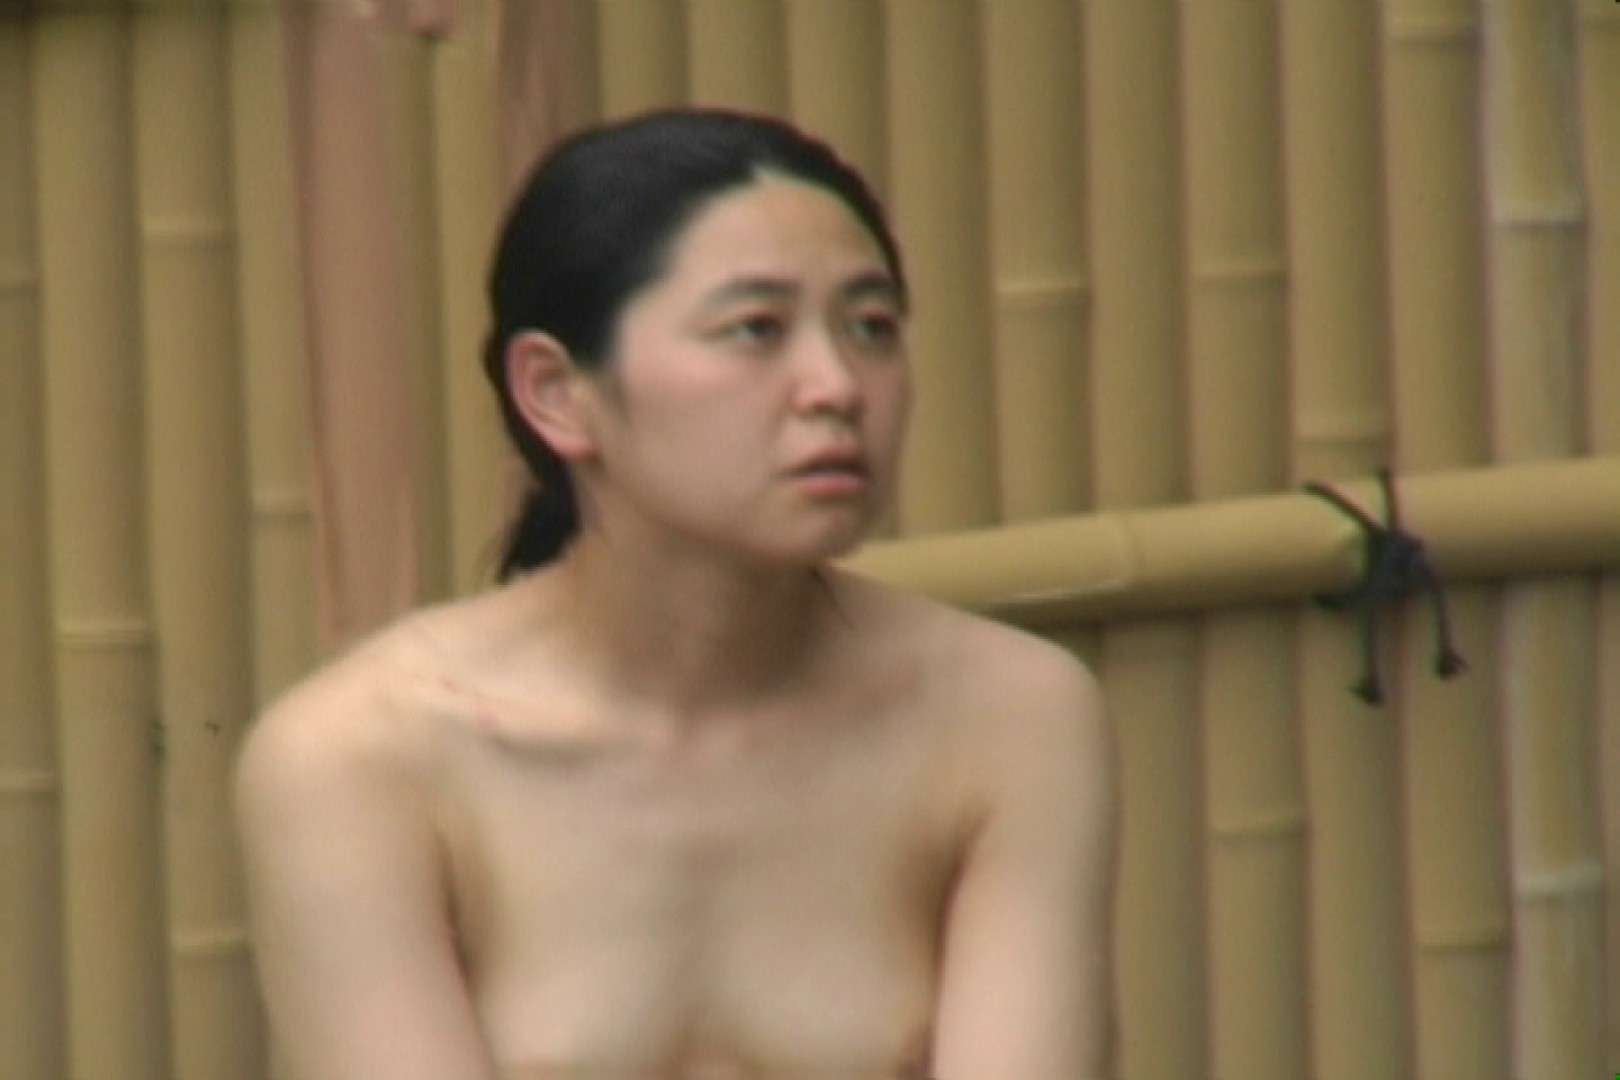 Aquaな露天風呂Vol.623 盗撮 SEX無修正画像 97画像 44